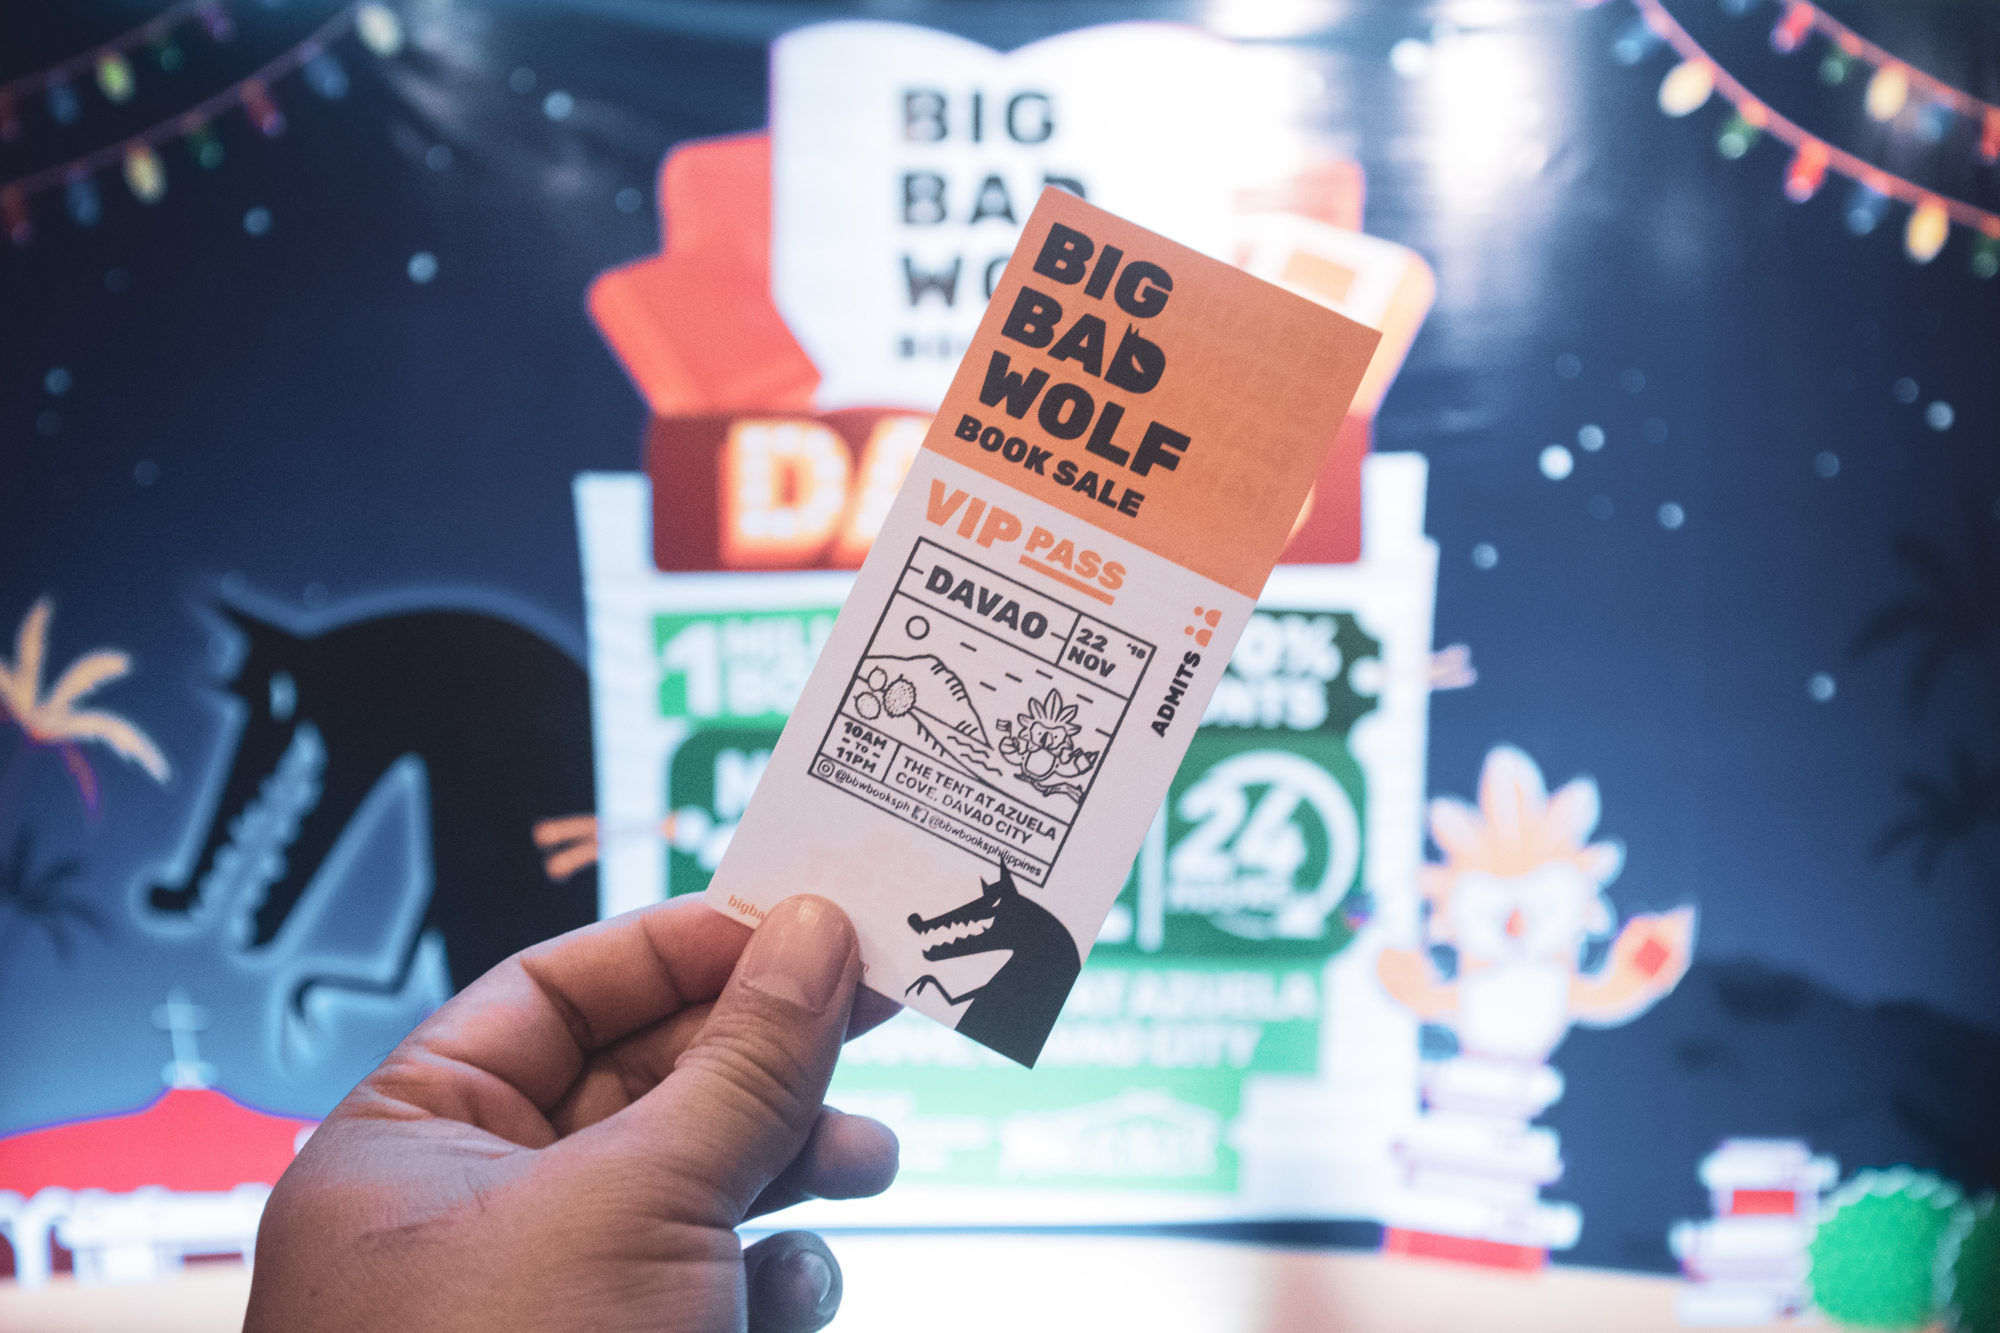 Big Bad Wolf Book Sale VIP pass